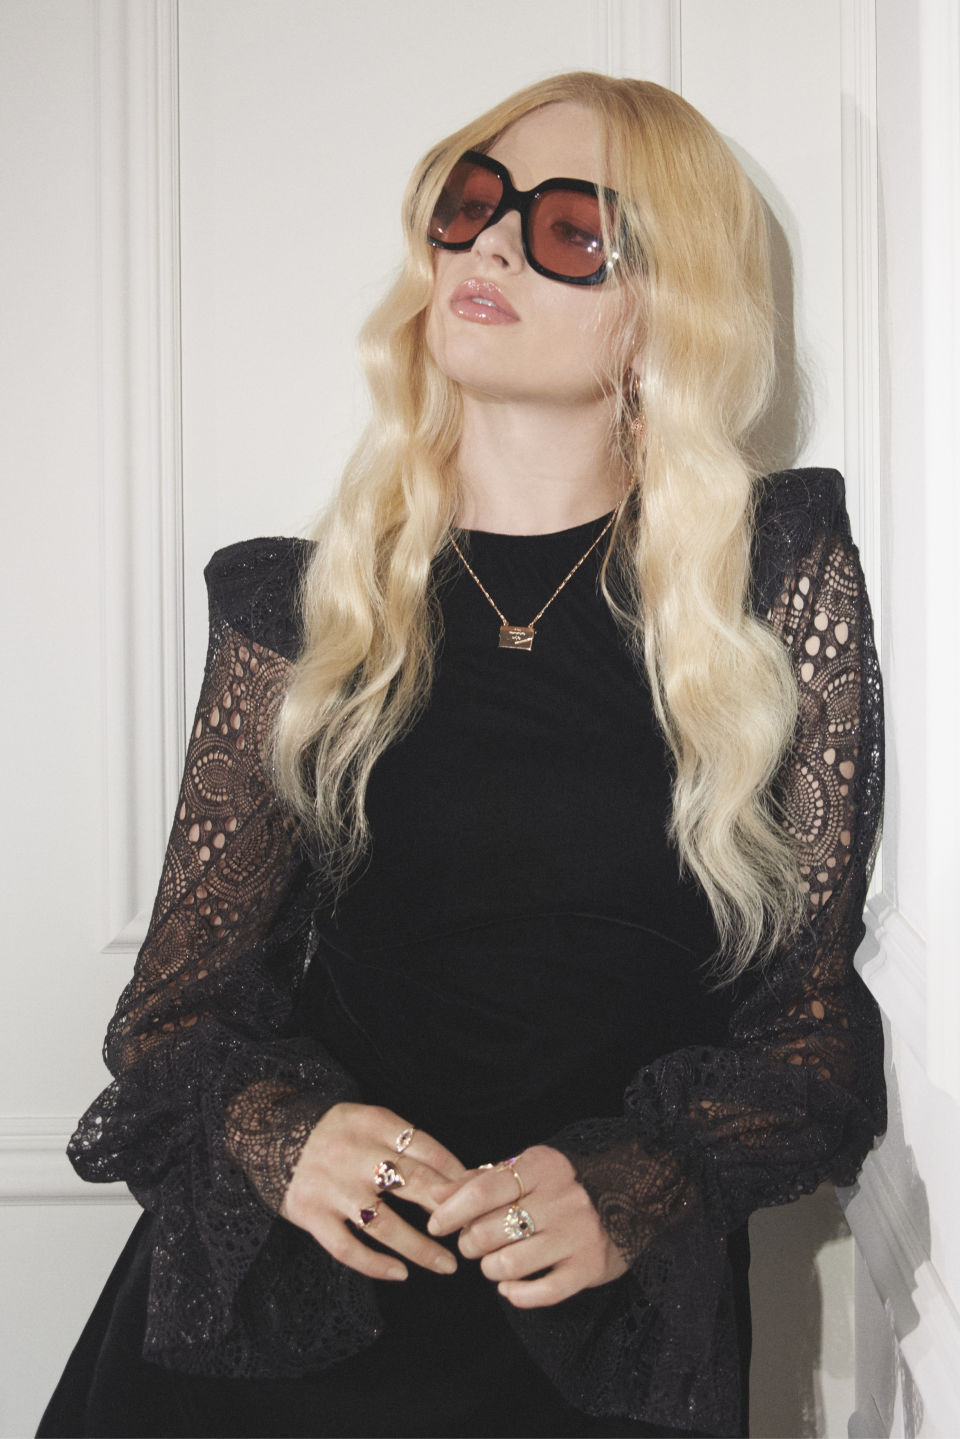 H&M и бренд Сьюзи Кейв The Vampire's Wife сделали коллаборацию (фото 1)